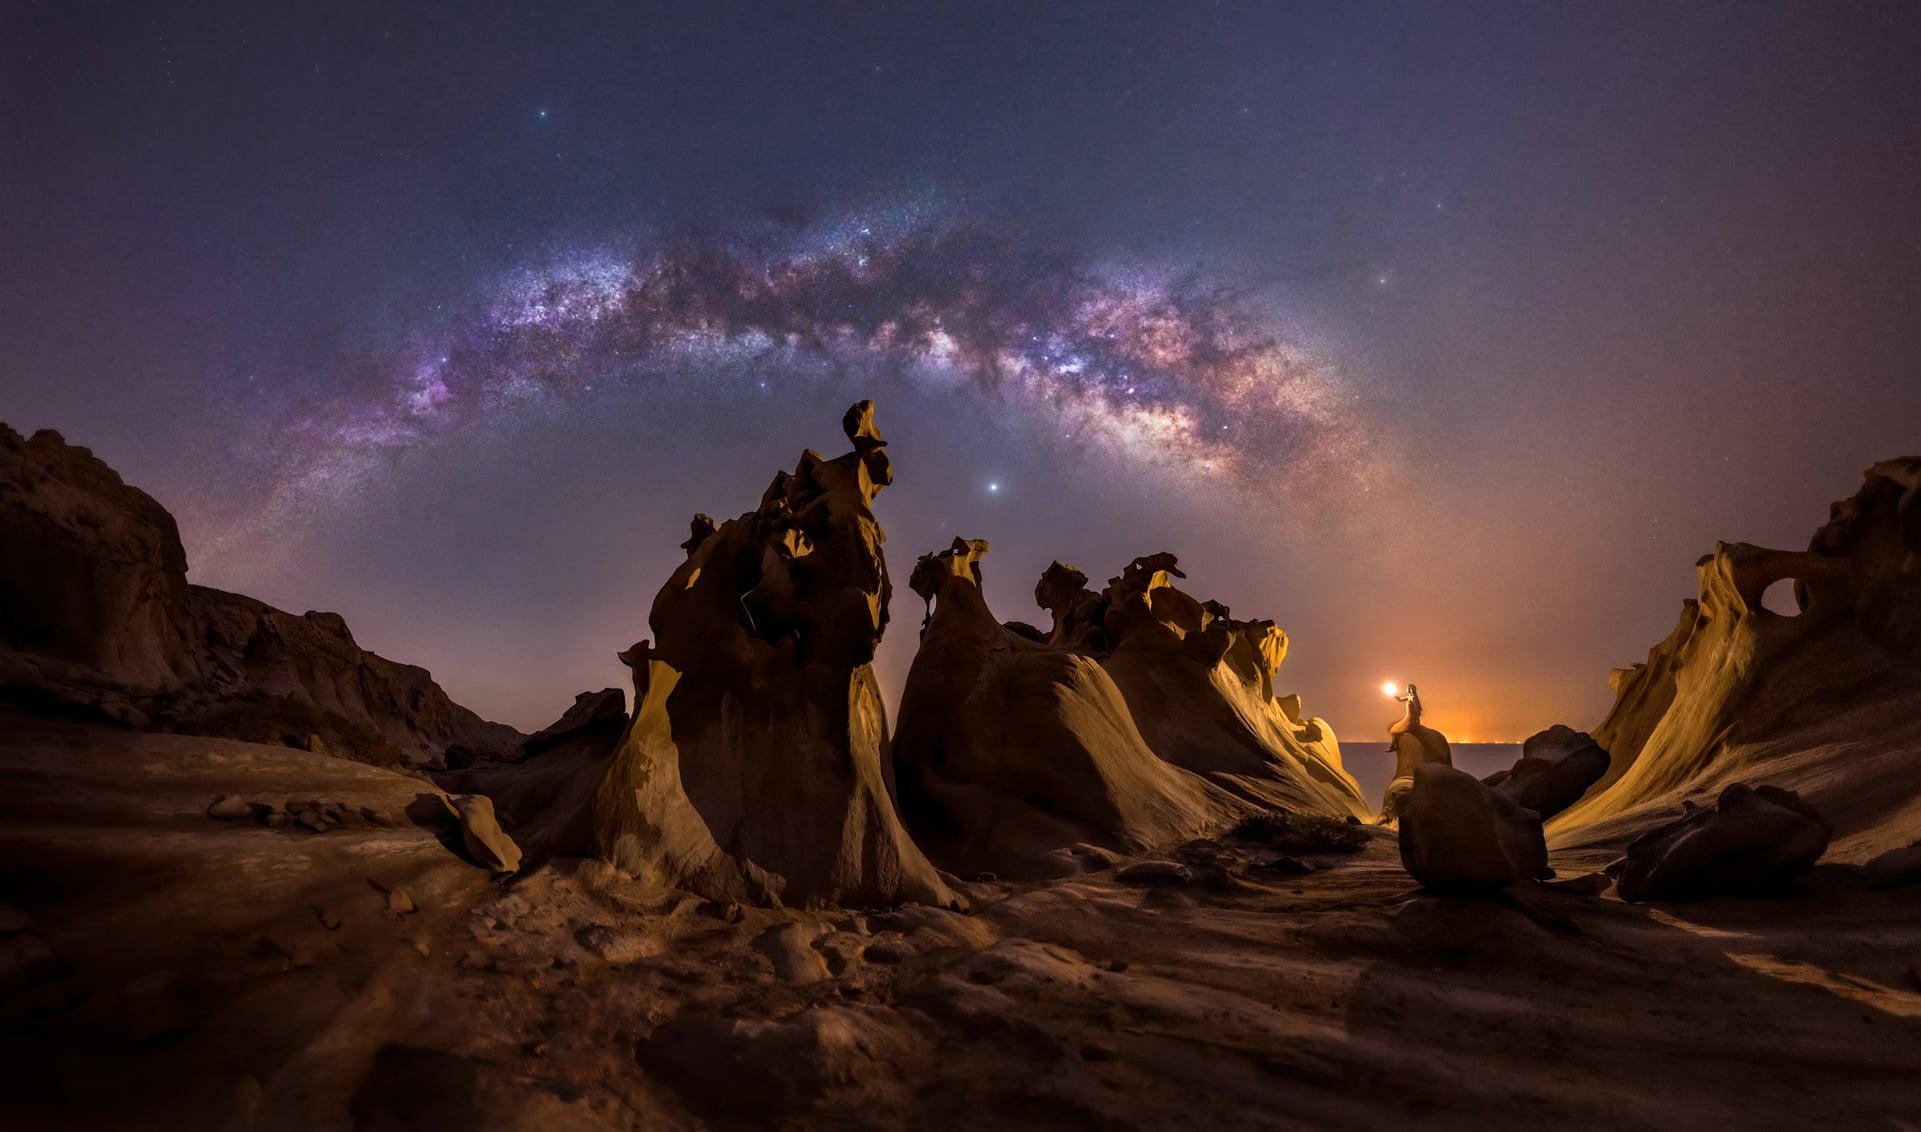 Best Milky Way photographs Capture the Atlas